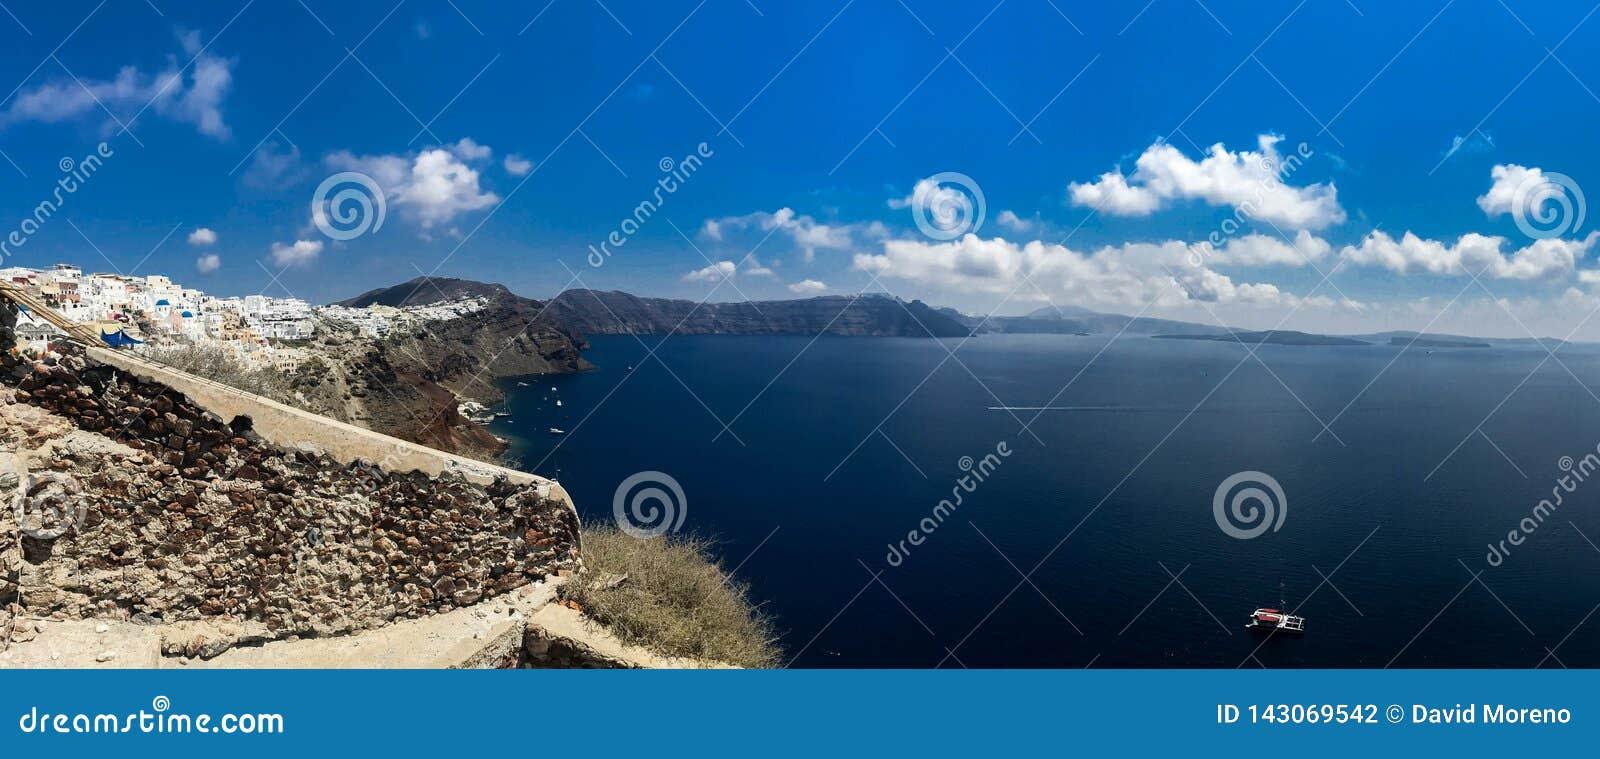 Sunny morning panorama of Santorini island. Colorful spring view offamous Greek resort Fira, Greece, Europe